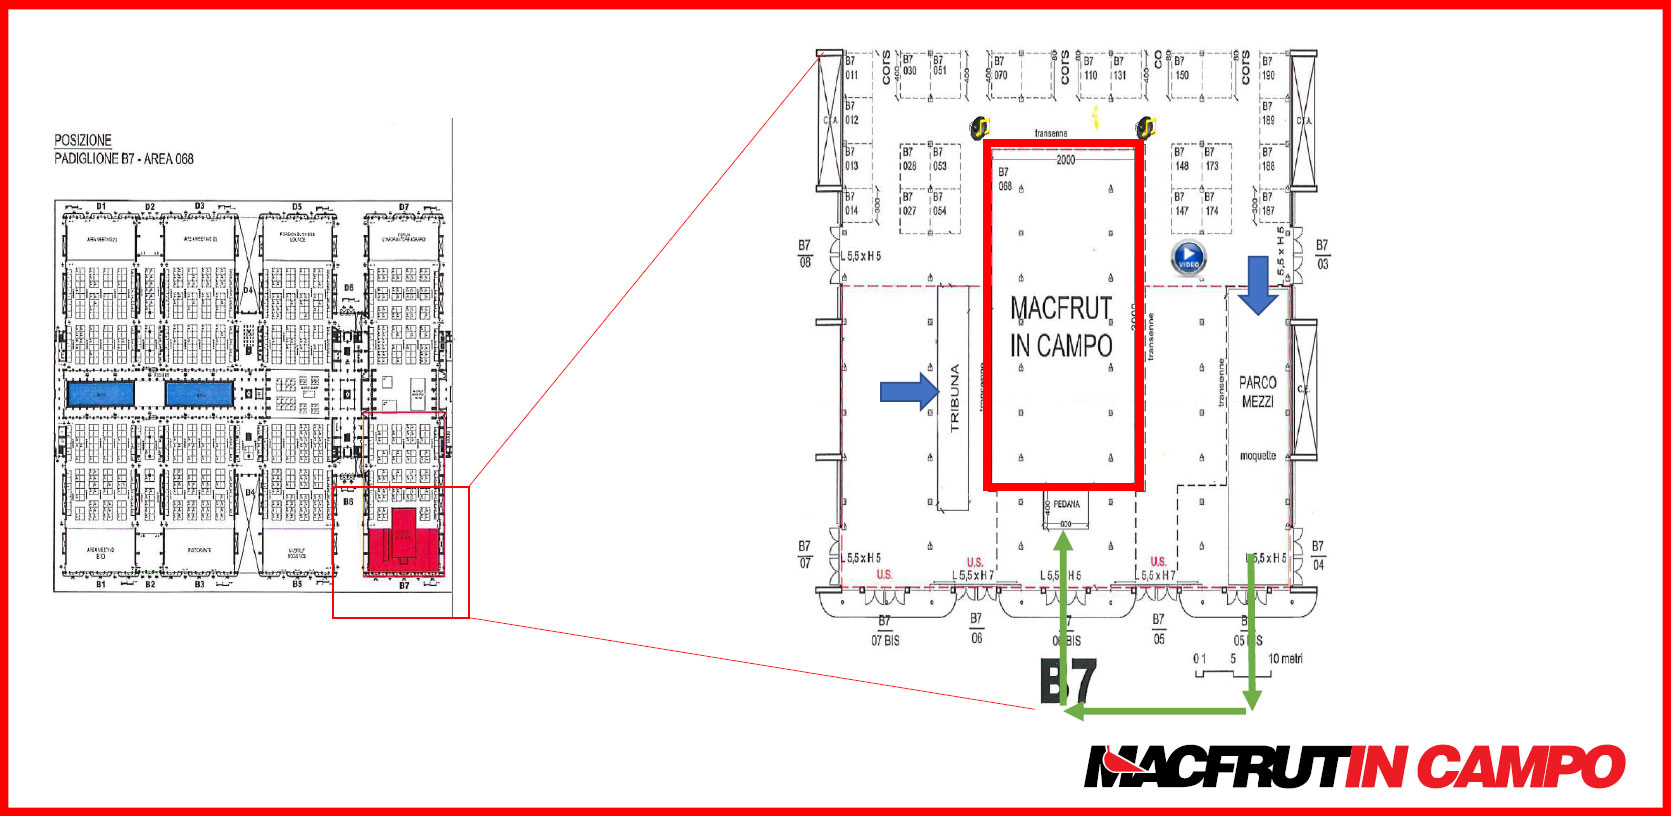 Macfrut-in-campo-mappa.jpg